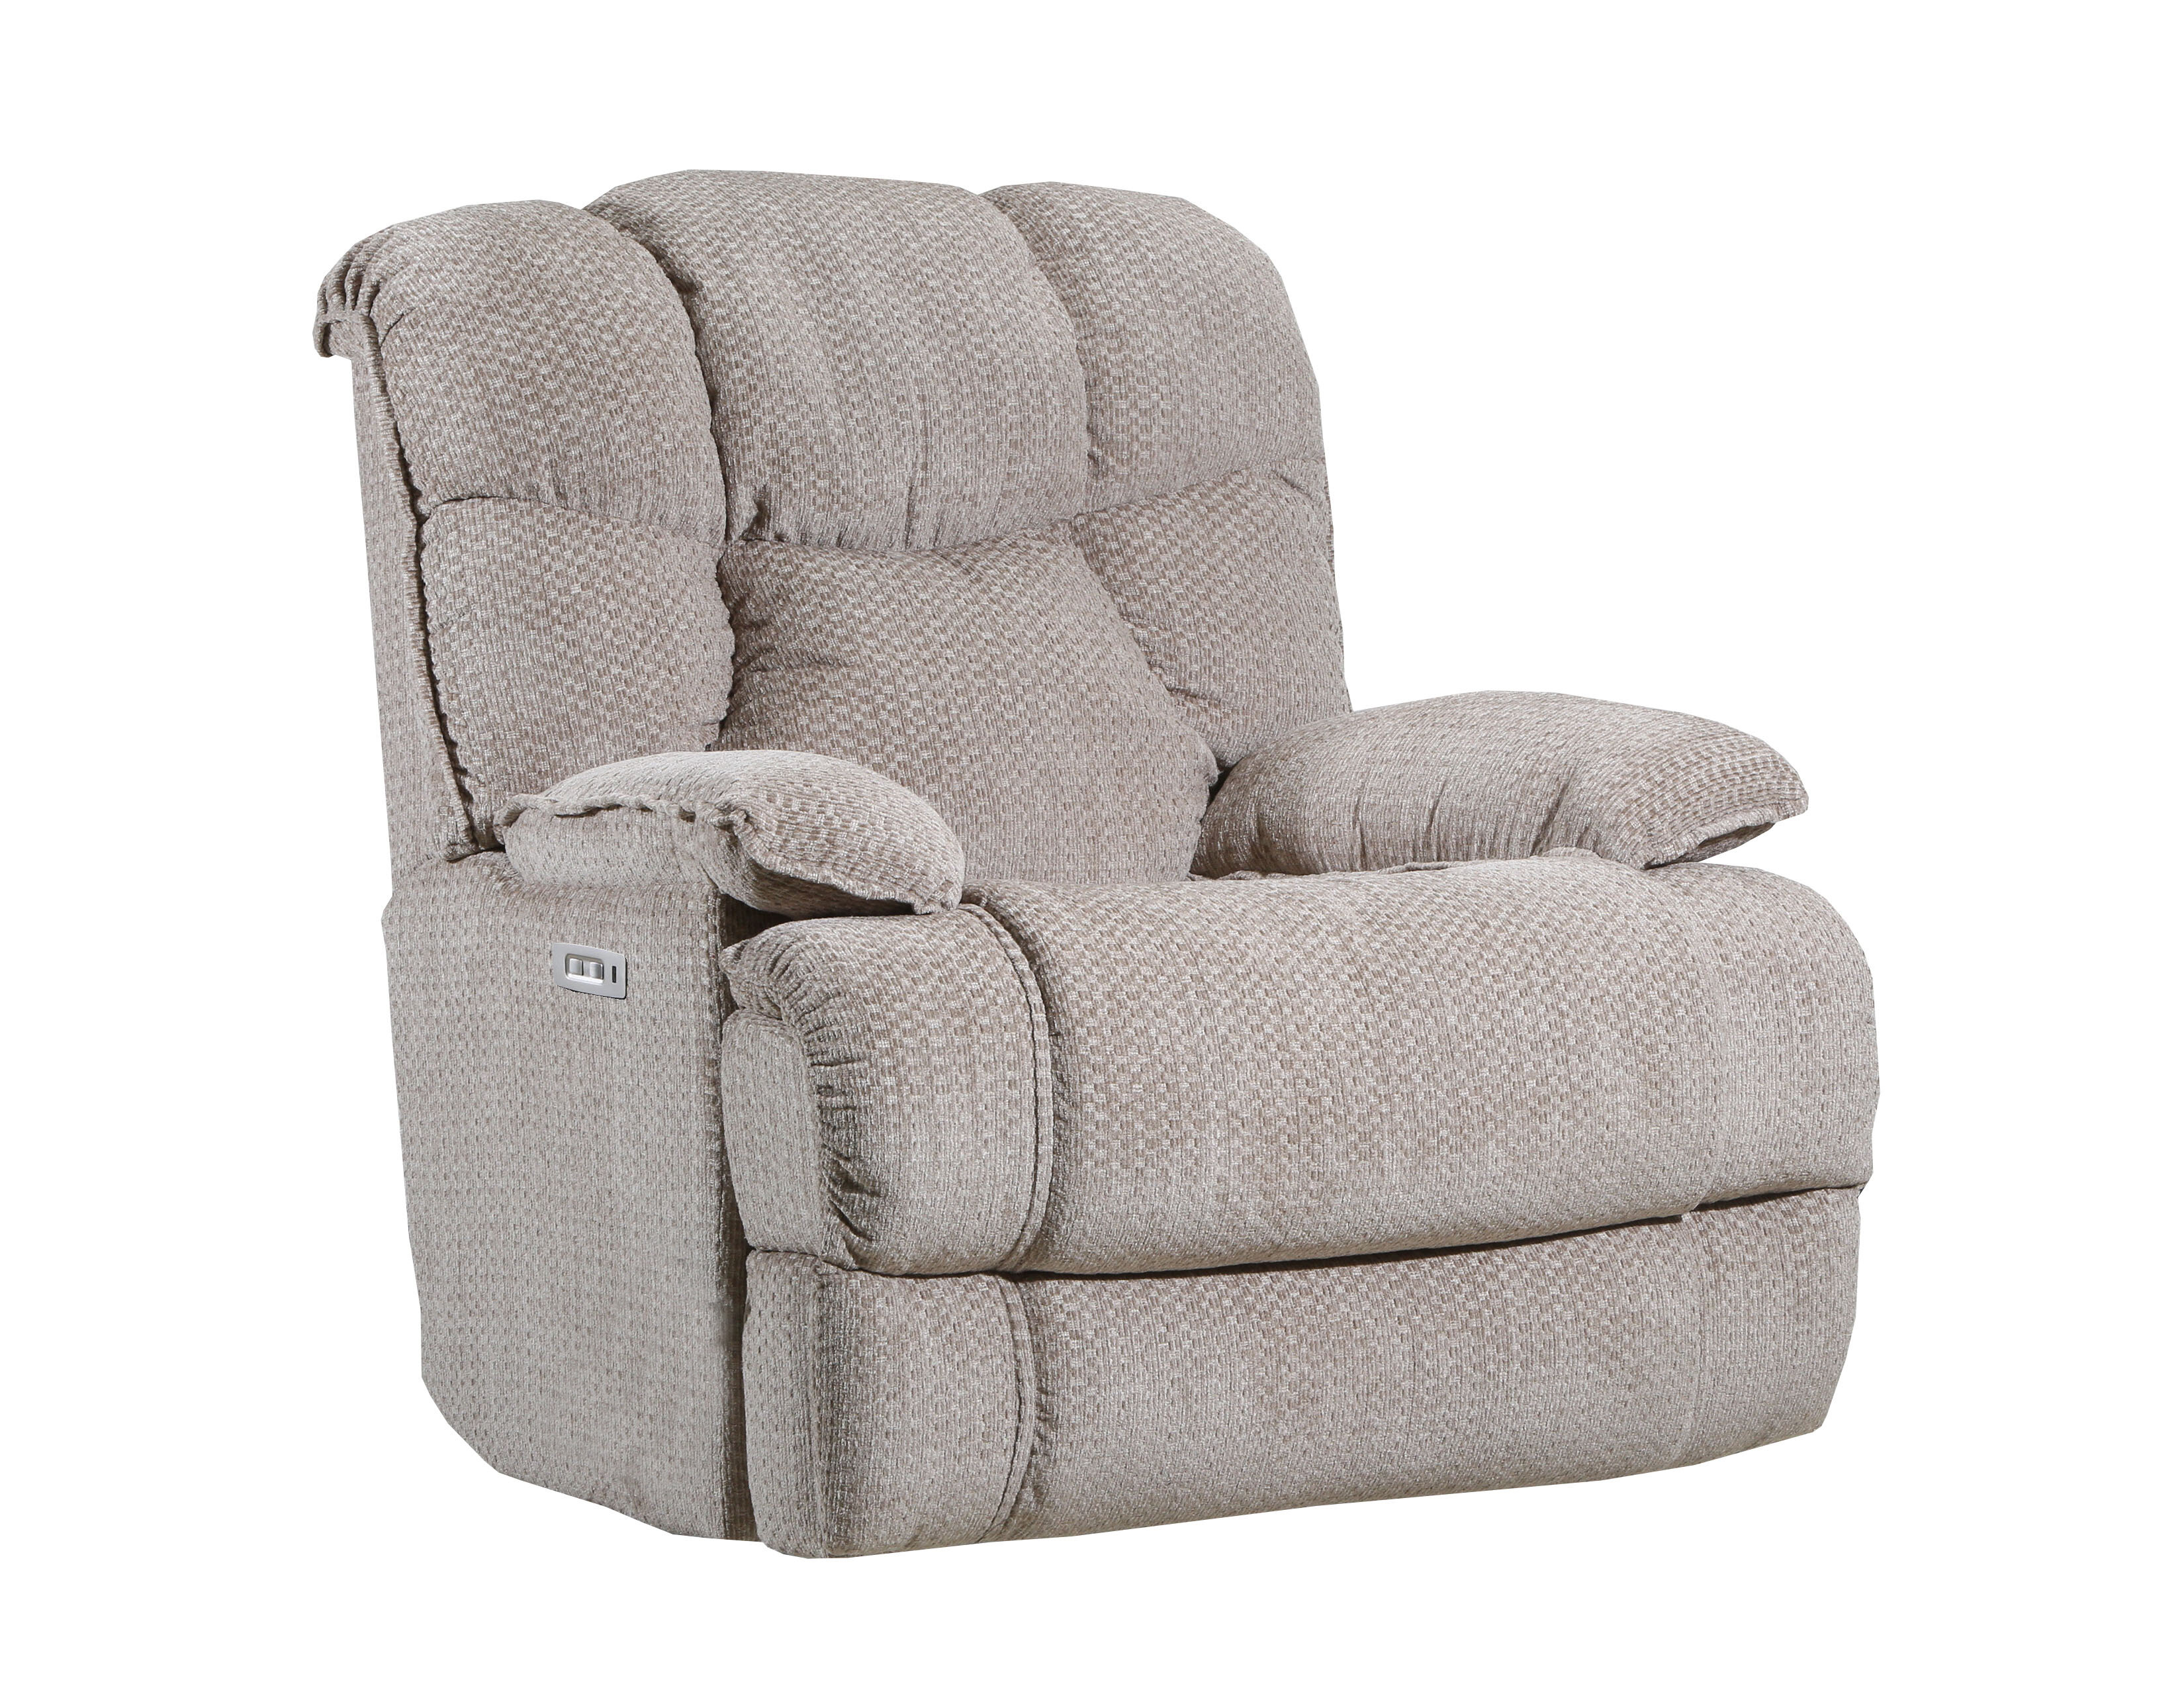 Lane Furniture Bruno Recliner Reviews Wayfair